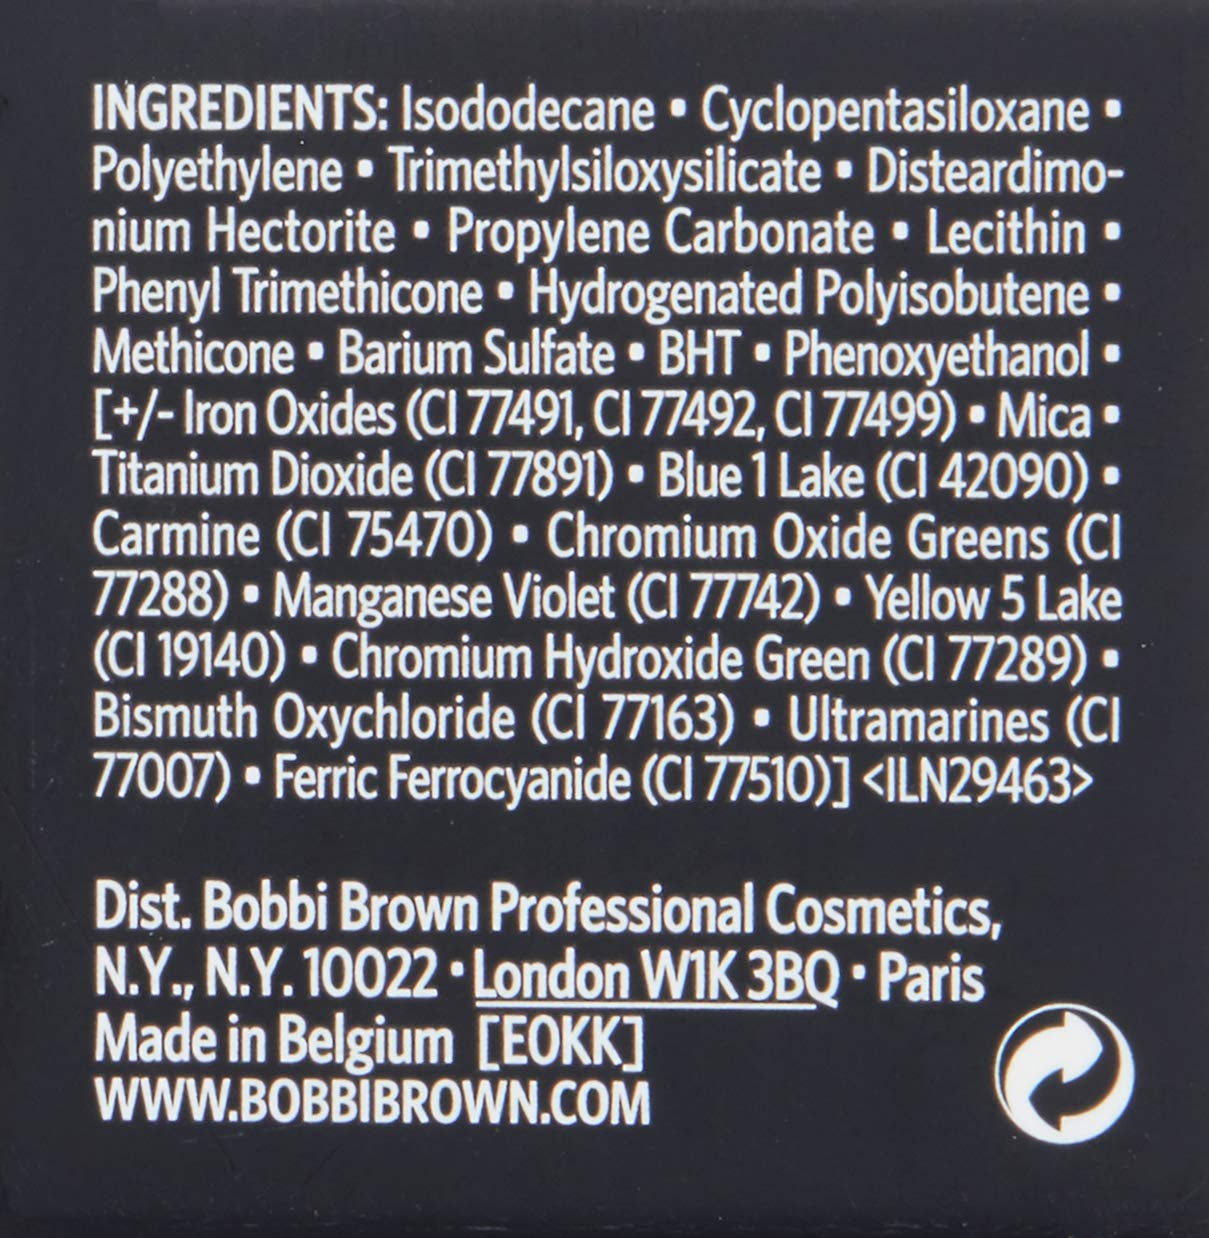 Bobbi Brown Long Wear Gel Eyeliner, No. 03 Cobalt Ink, 0.1 Ounce by Bobbi Brown (Image #2)